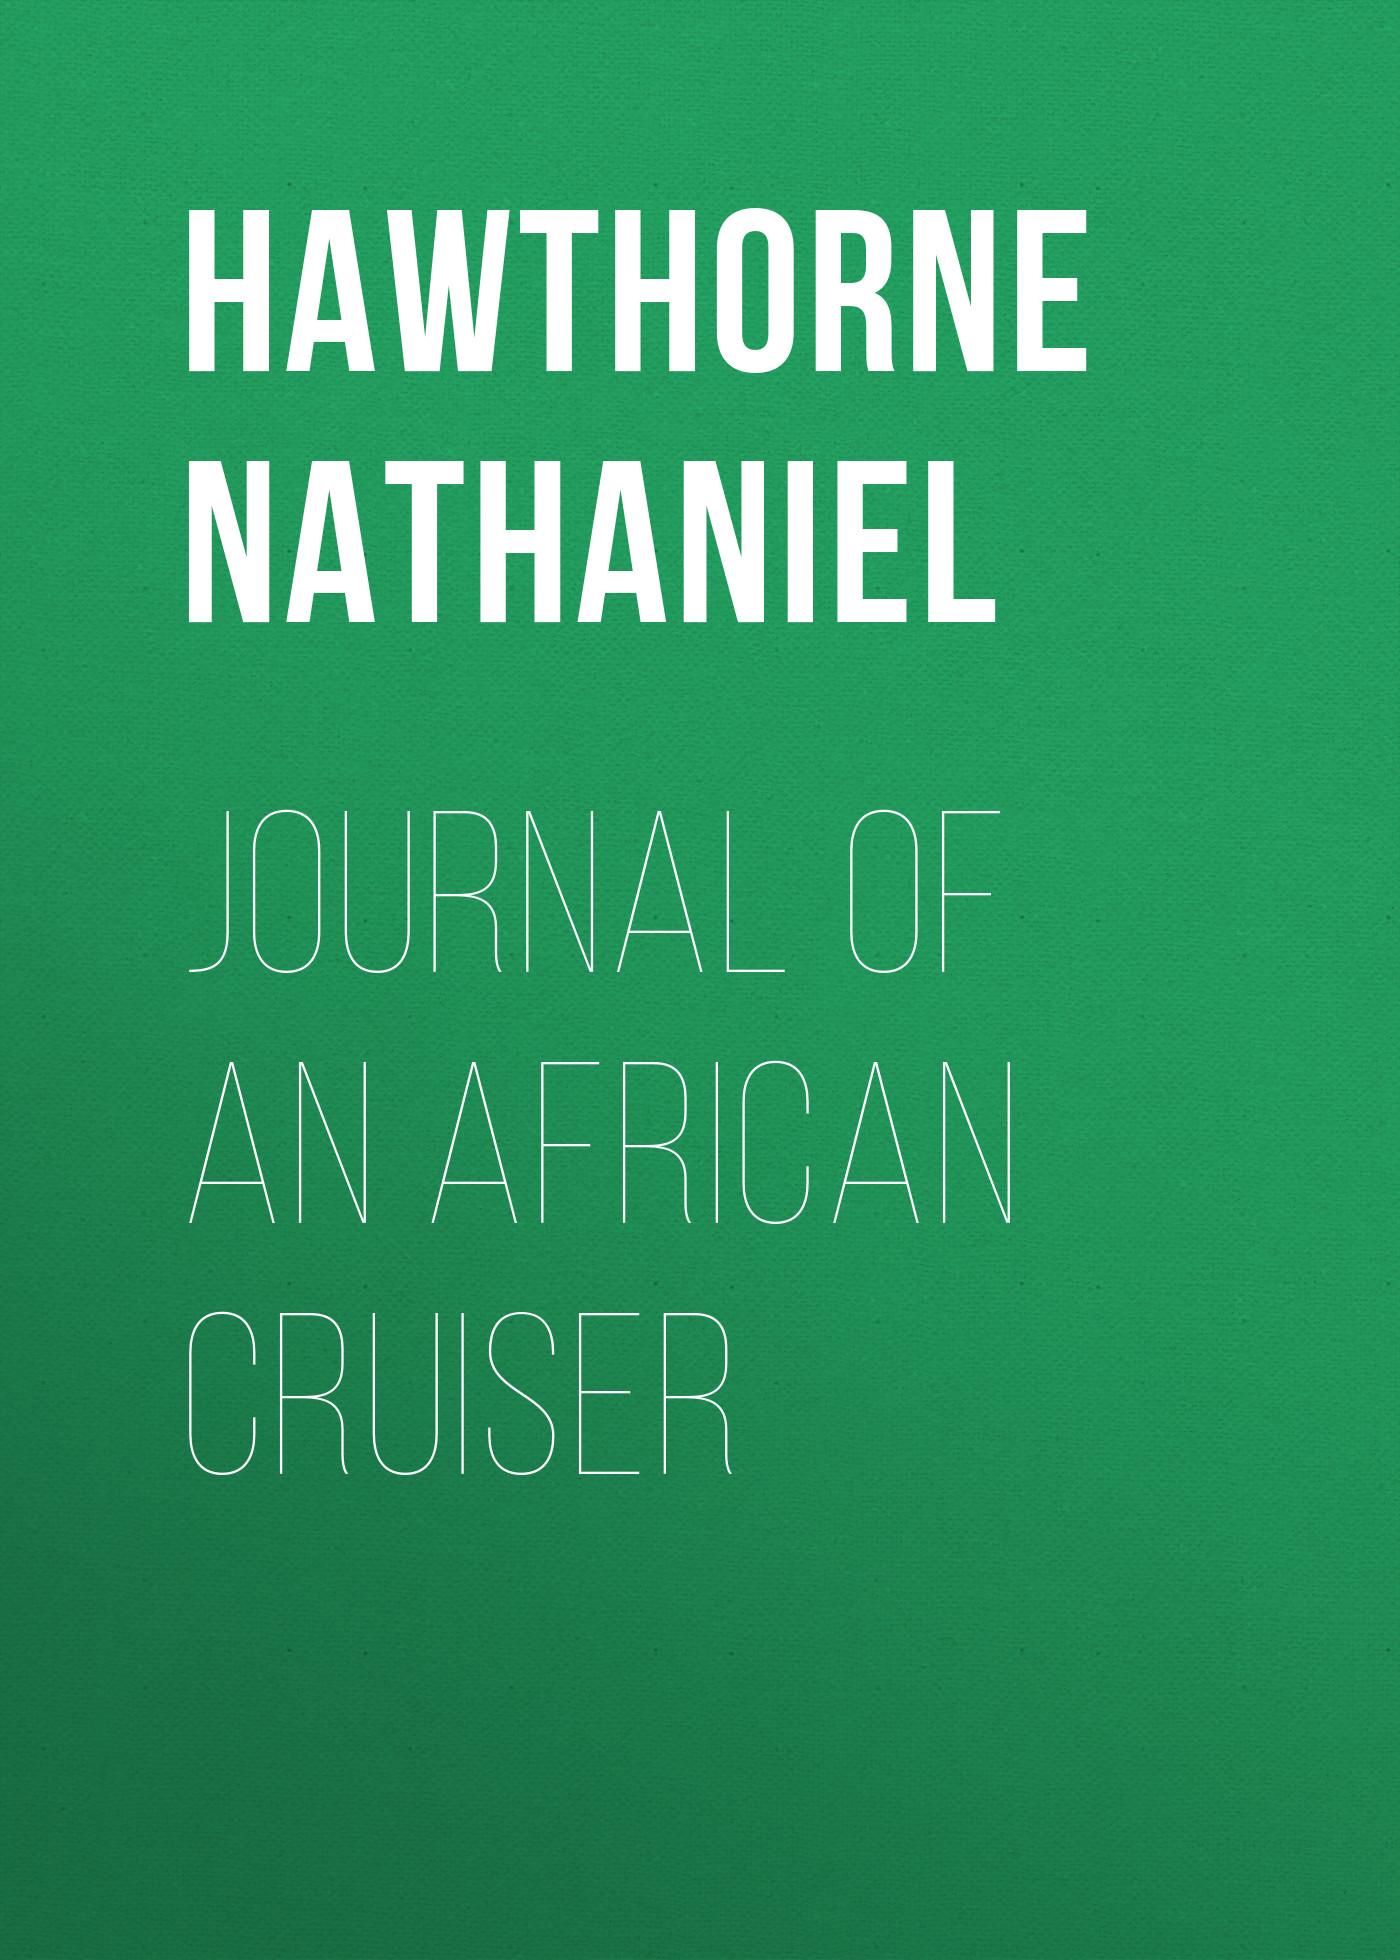 Hawthorne Nathaniel Journal of an African Cruiser hawthorne nathaniel love letters of nathaniel hawthorne volume 1 of 2